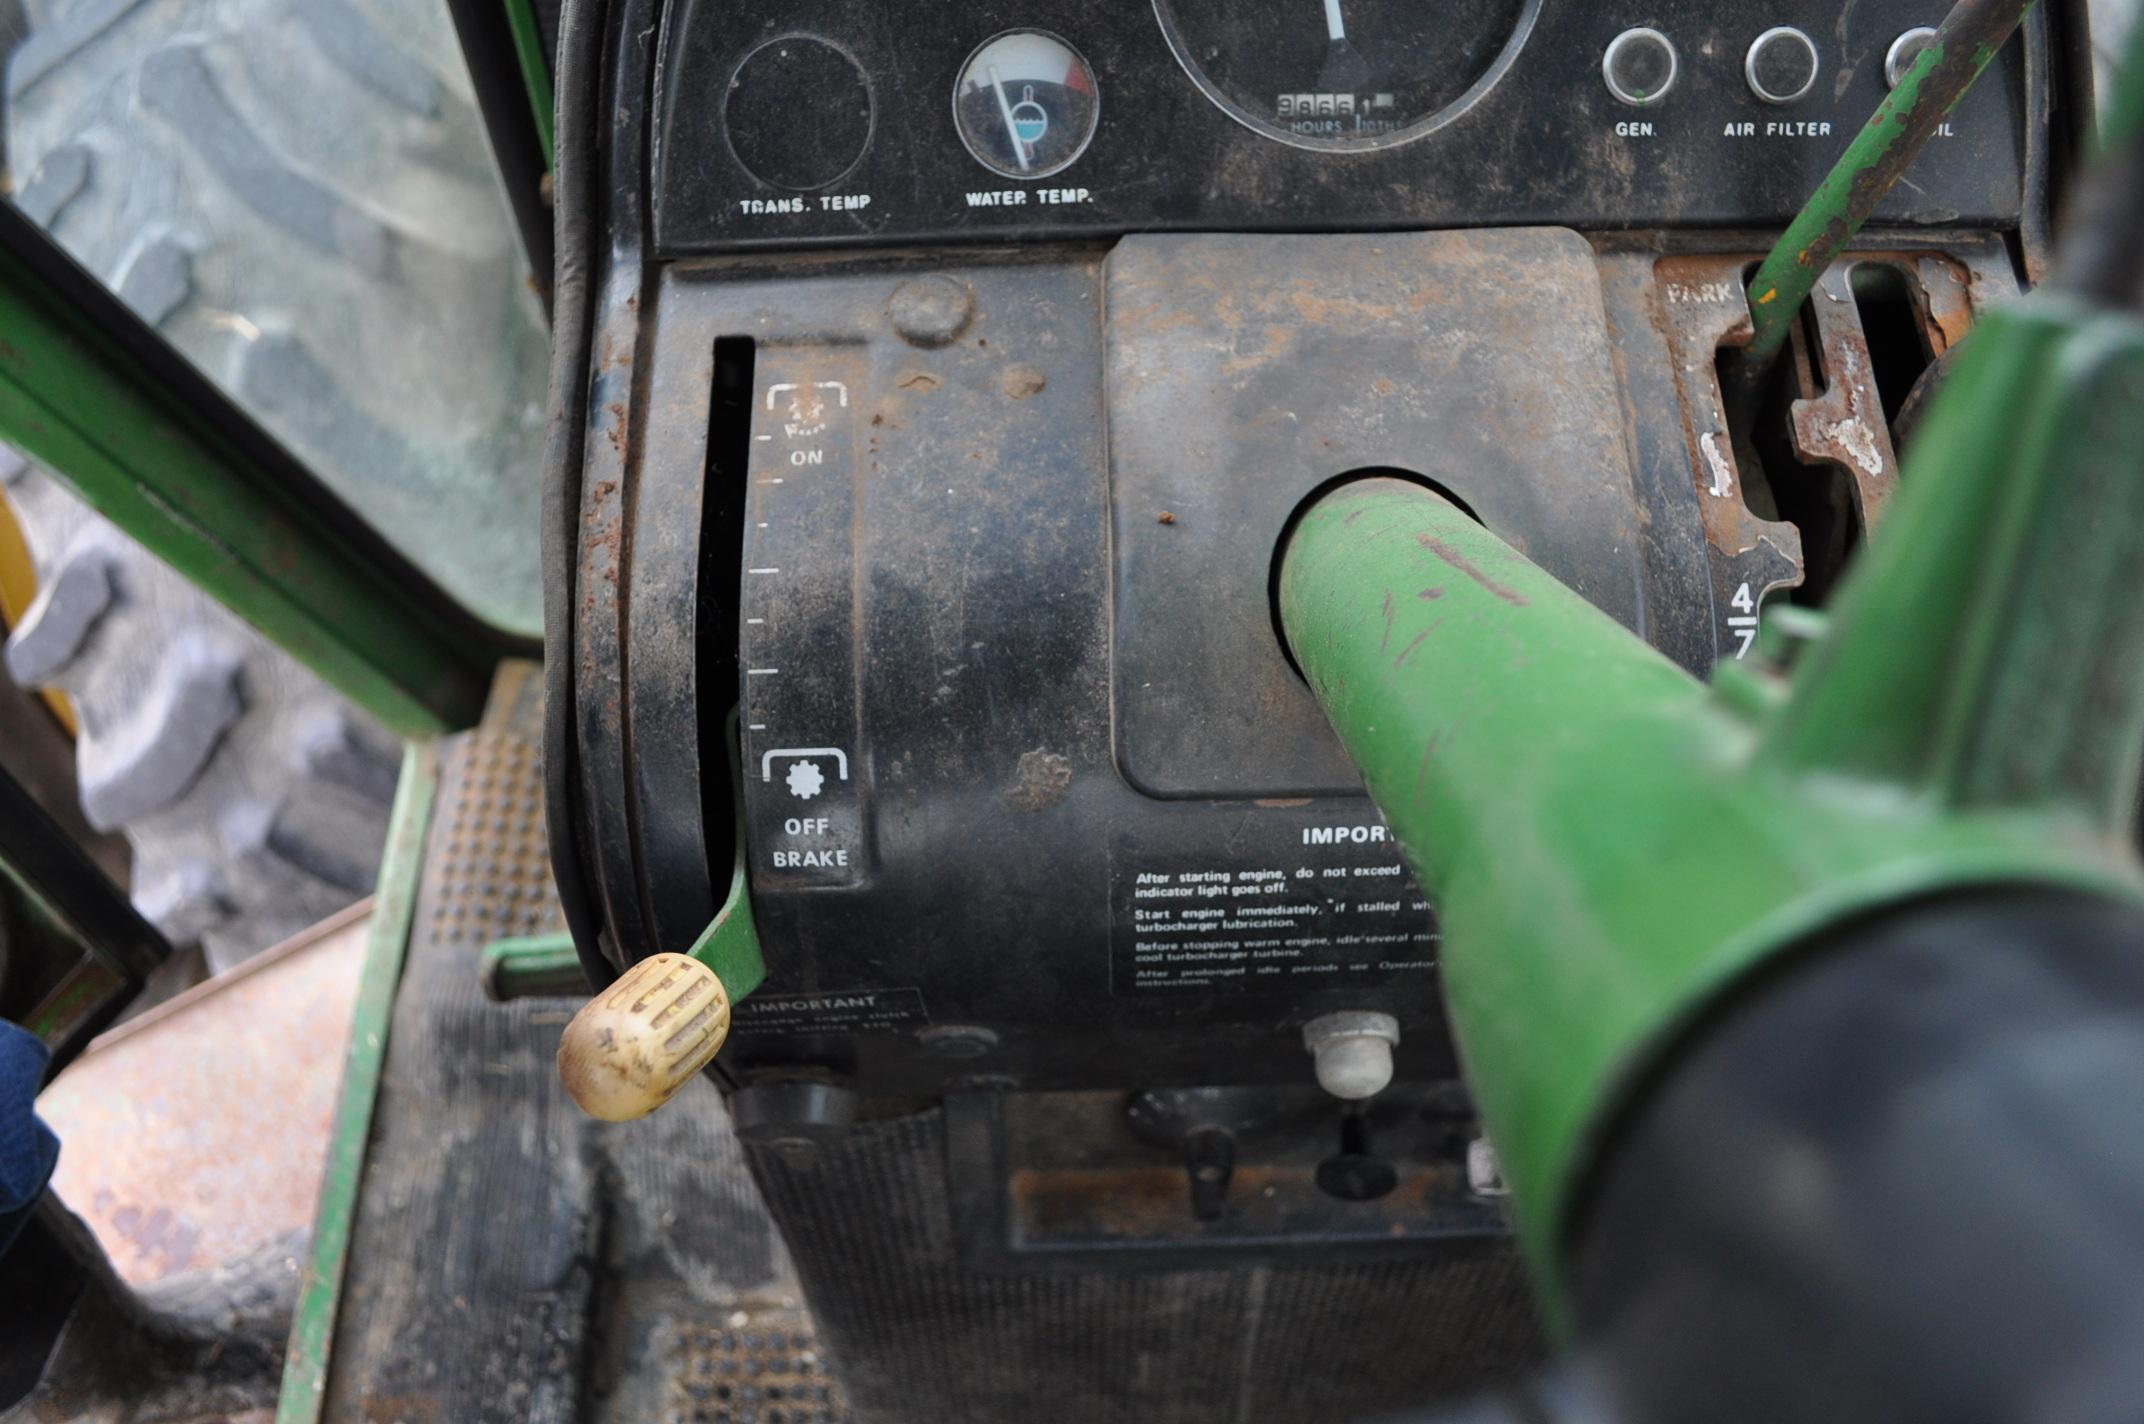 John Deere 7520 tractor, 4WD, diesel, 18.4-34 duals, original fenders, CHA, cab interior kit, 3 - Image 22 of 24